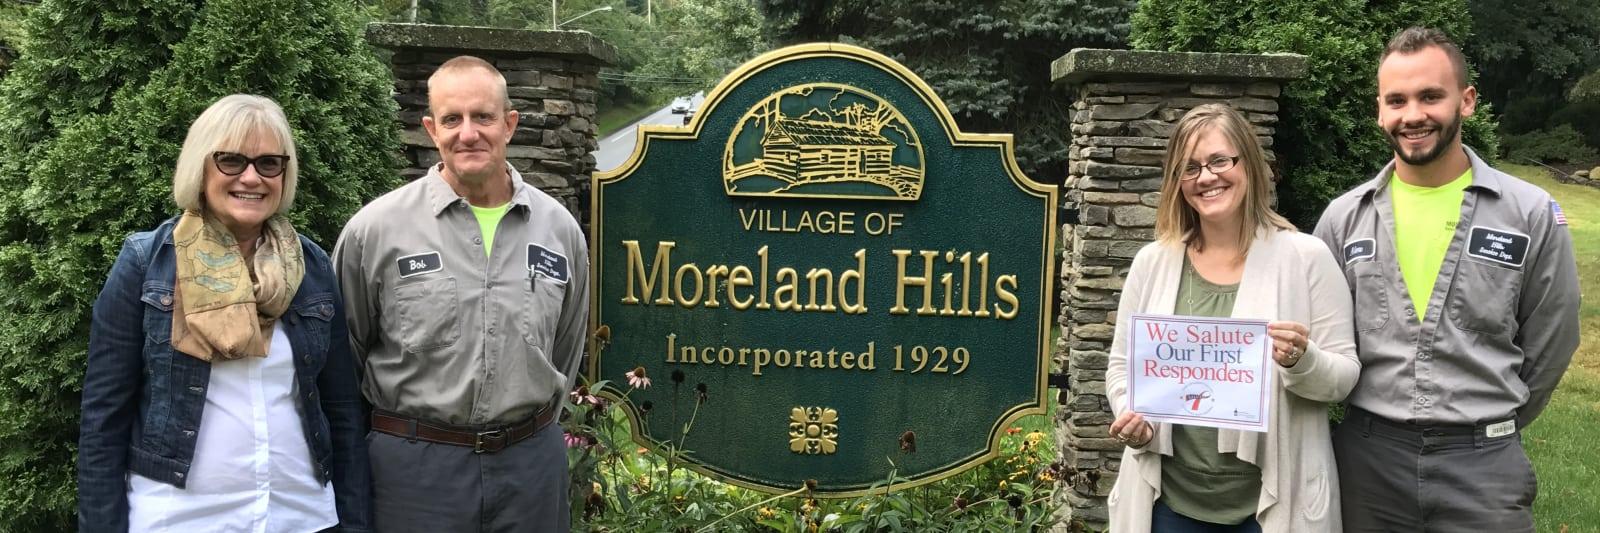 Moreland-Hills.JPG-w1600.jpg